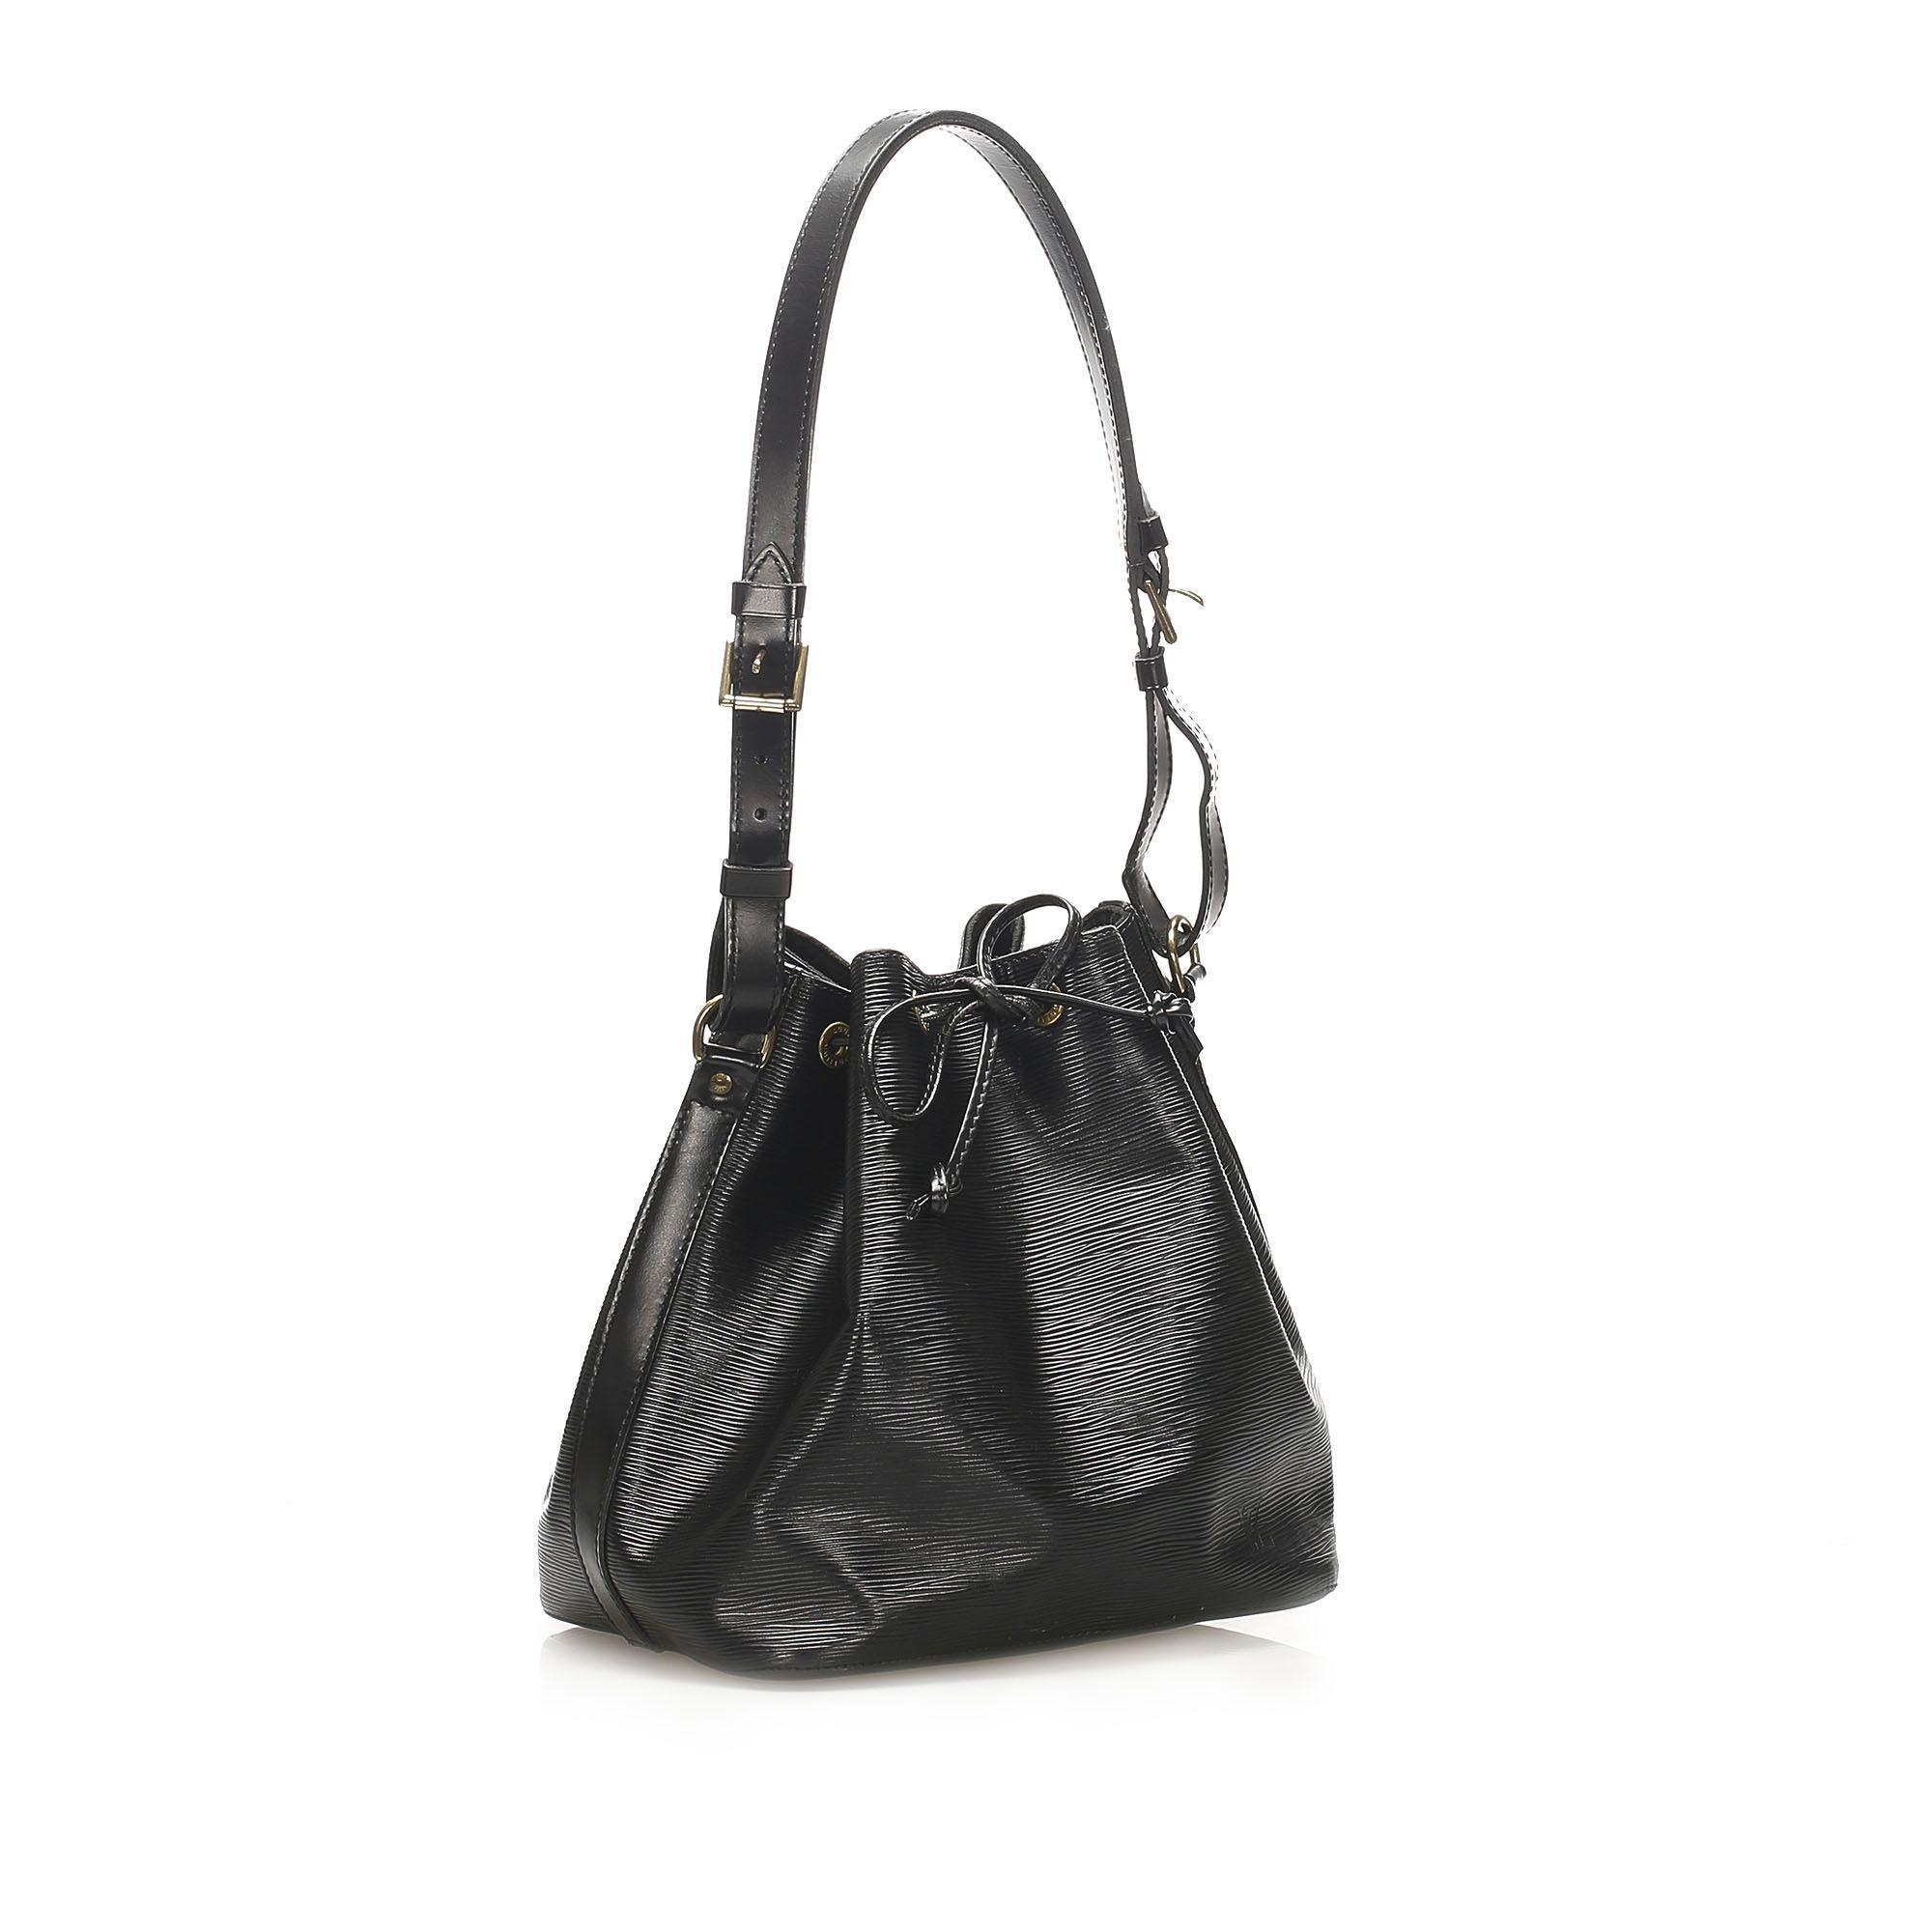 Vintage Louis Vuitton Epi Petit Noe Black